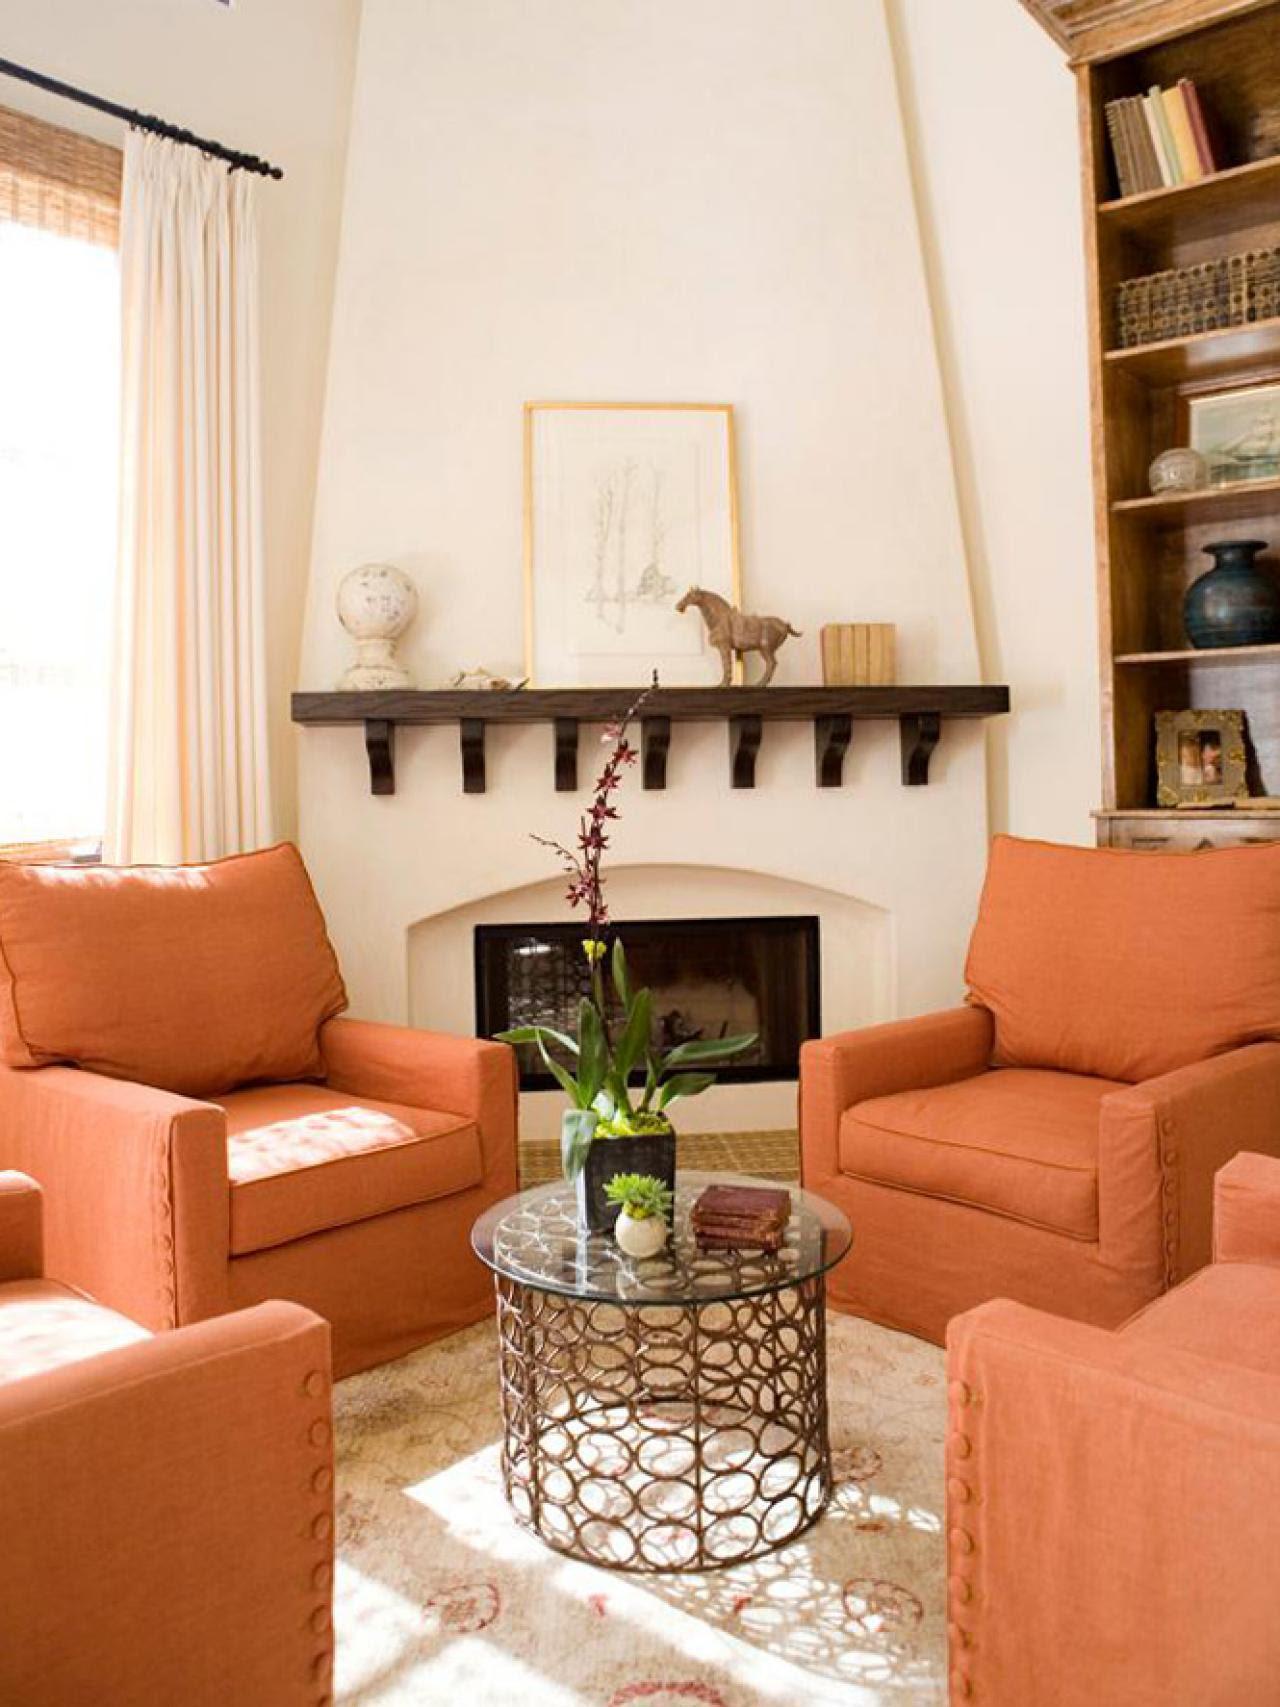 28 Stunning Orange Living Room Designs Ideas - Decoration Love